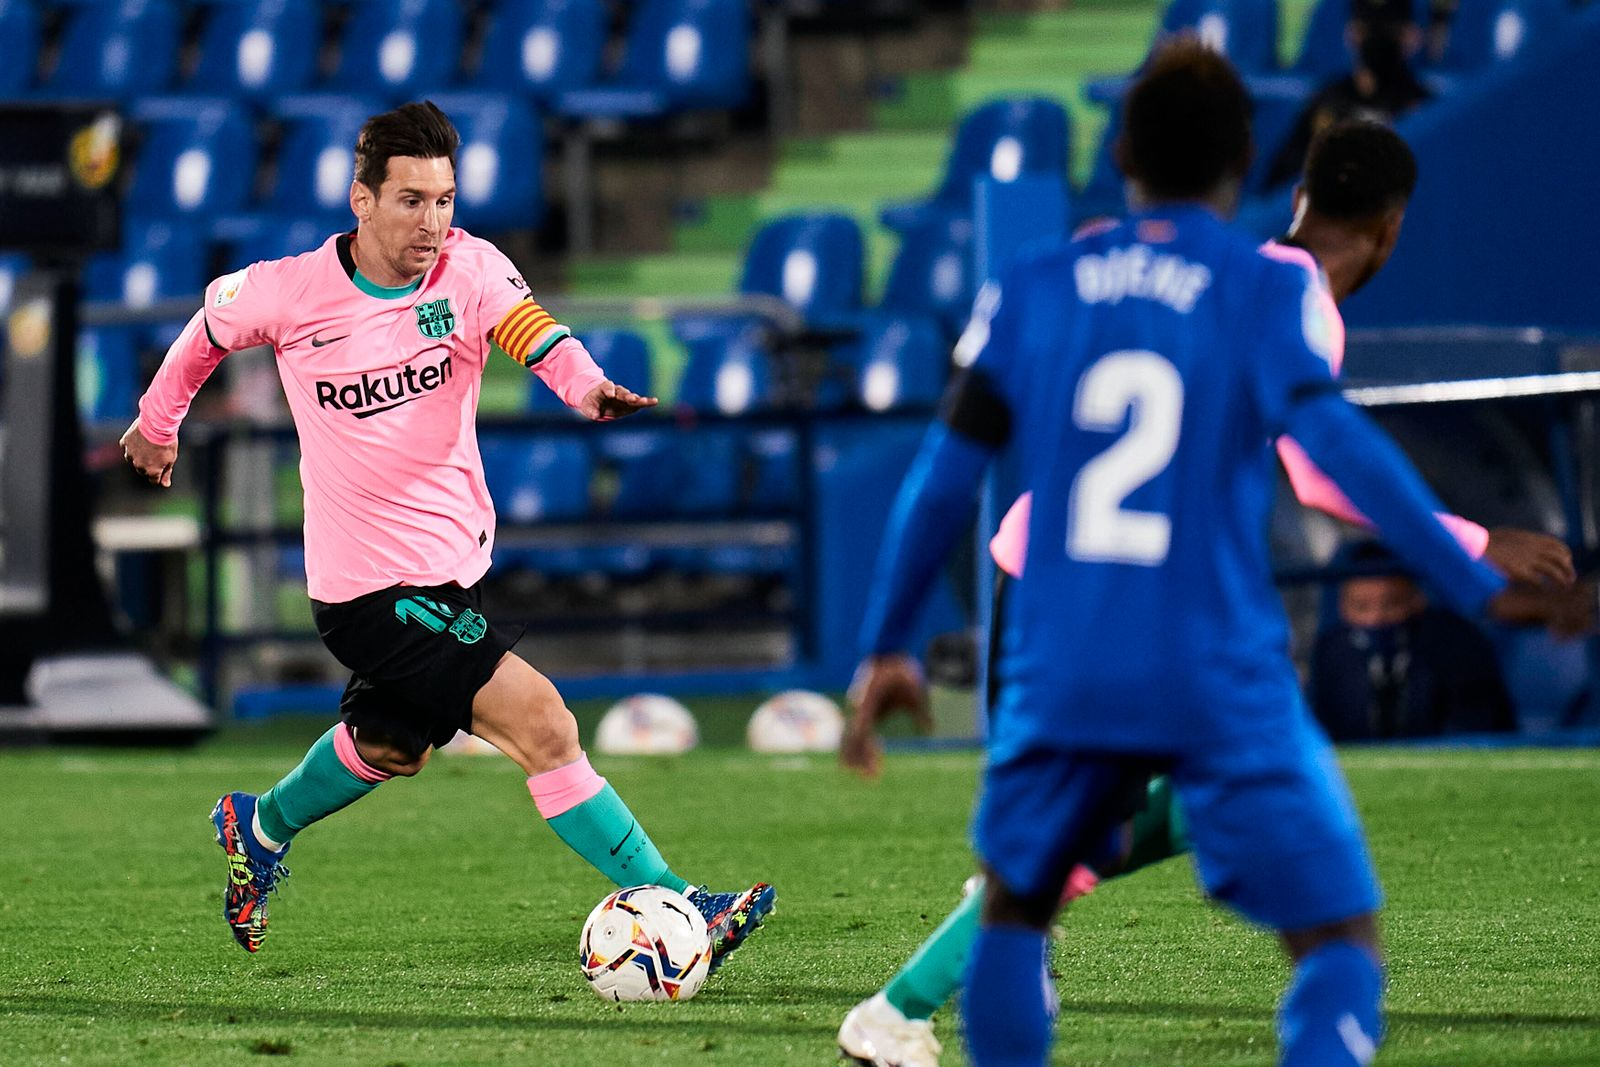 October 17, 2020, Getafe, Madrid, Spain: Lionel Messi of FC Barcelona, Barca during La Liga Santander match between Geta